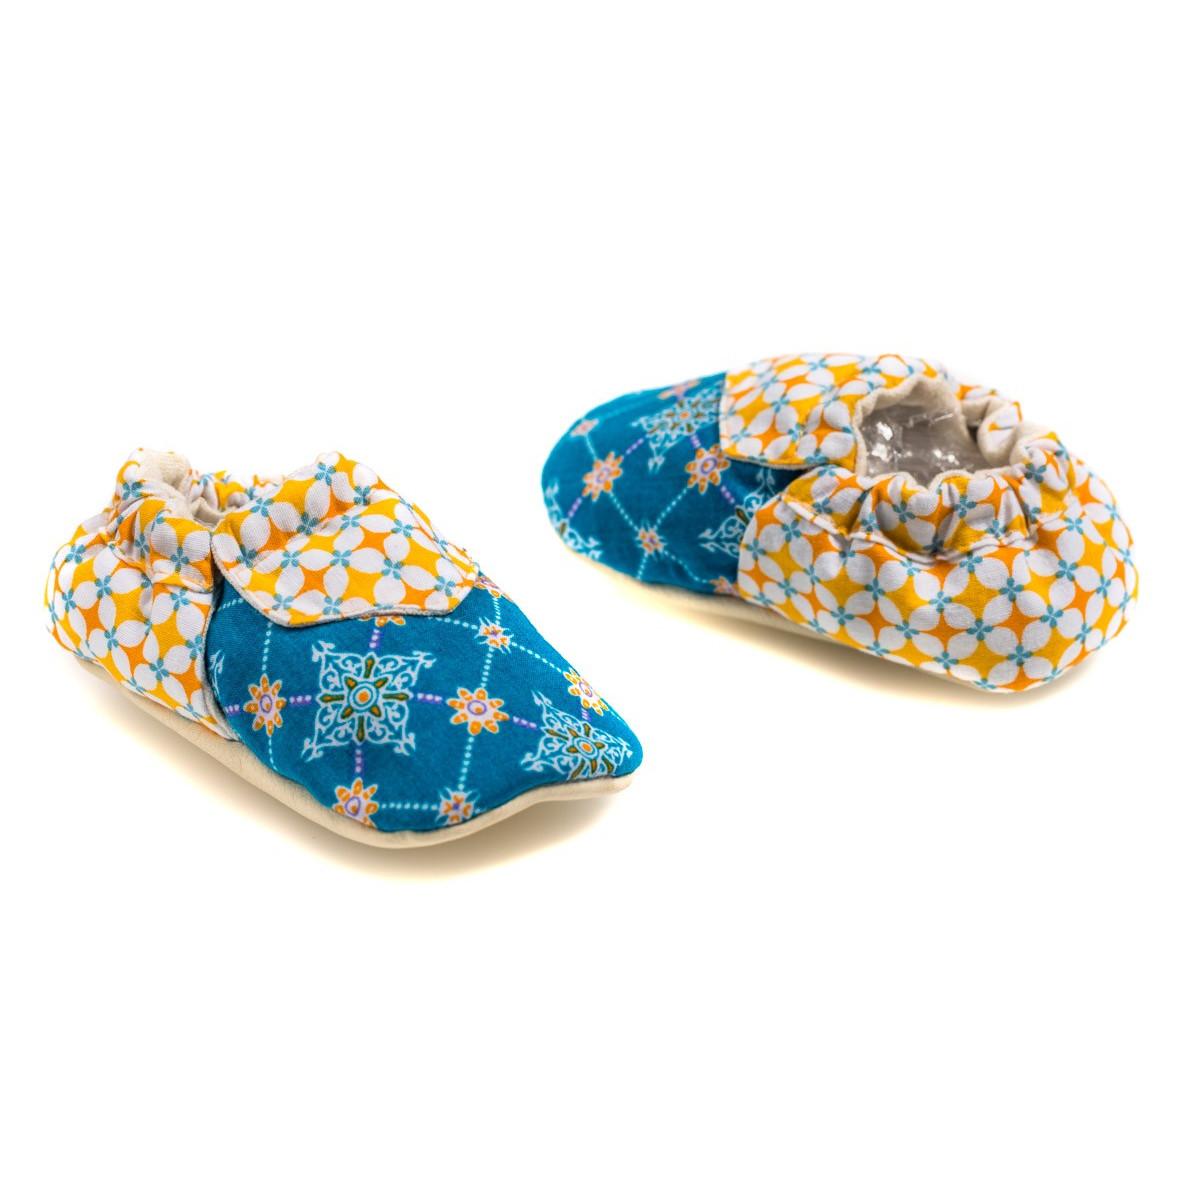 Chaussons souples bébé 0-12 mois tissu Najima